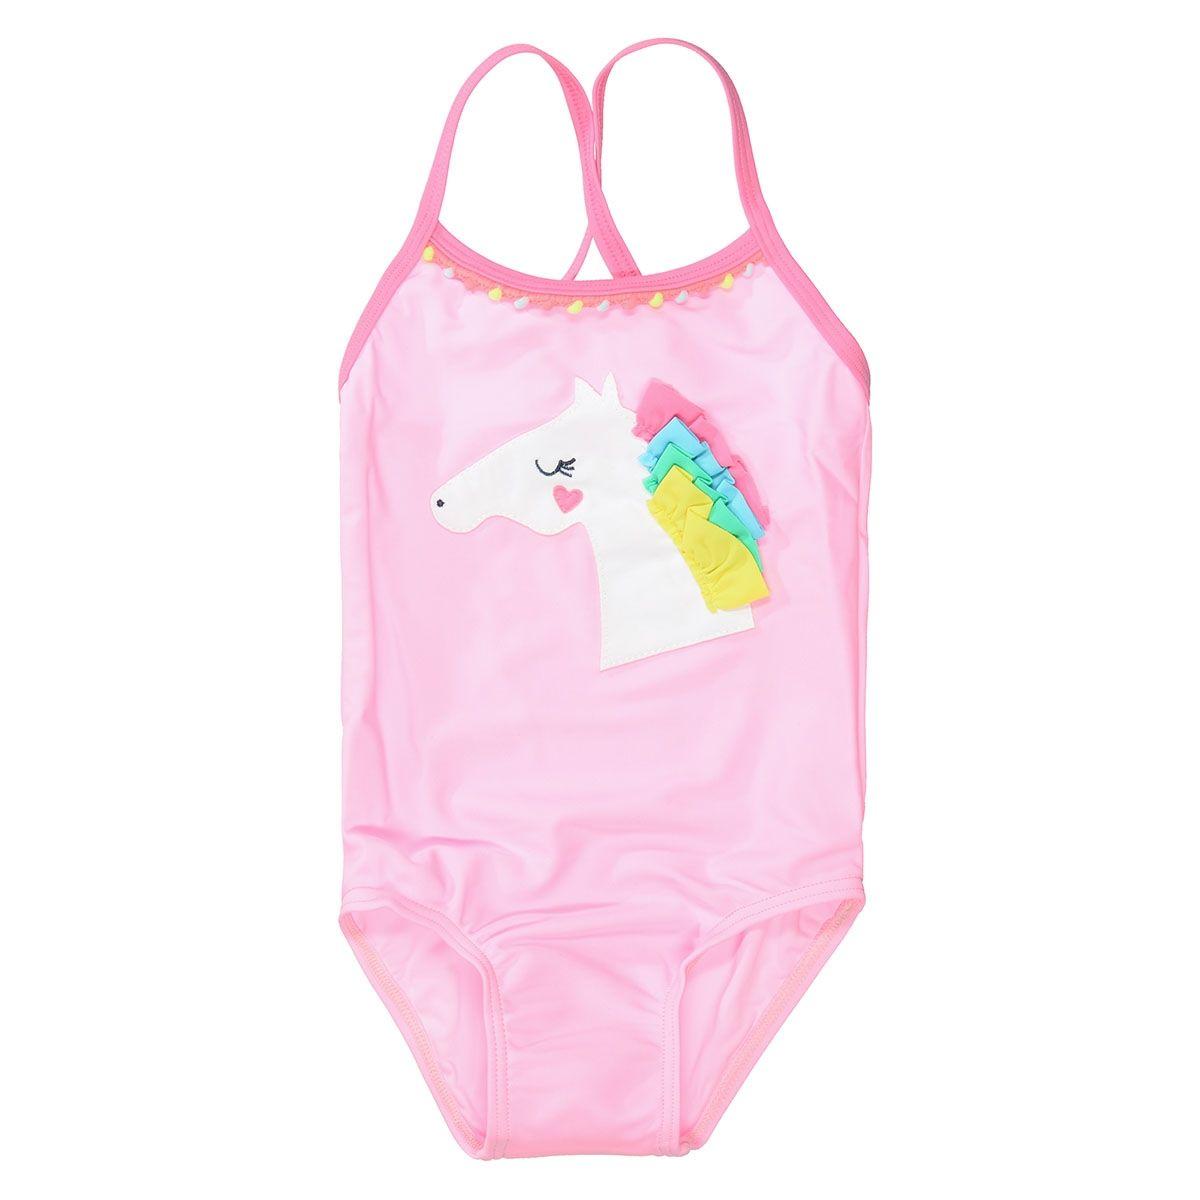 Badeanzug mit Applikation - Pink